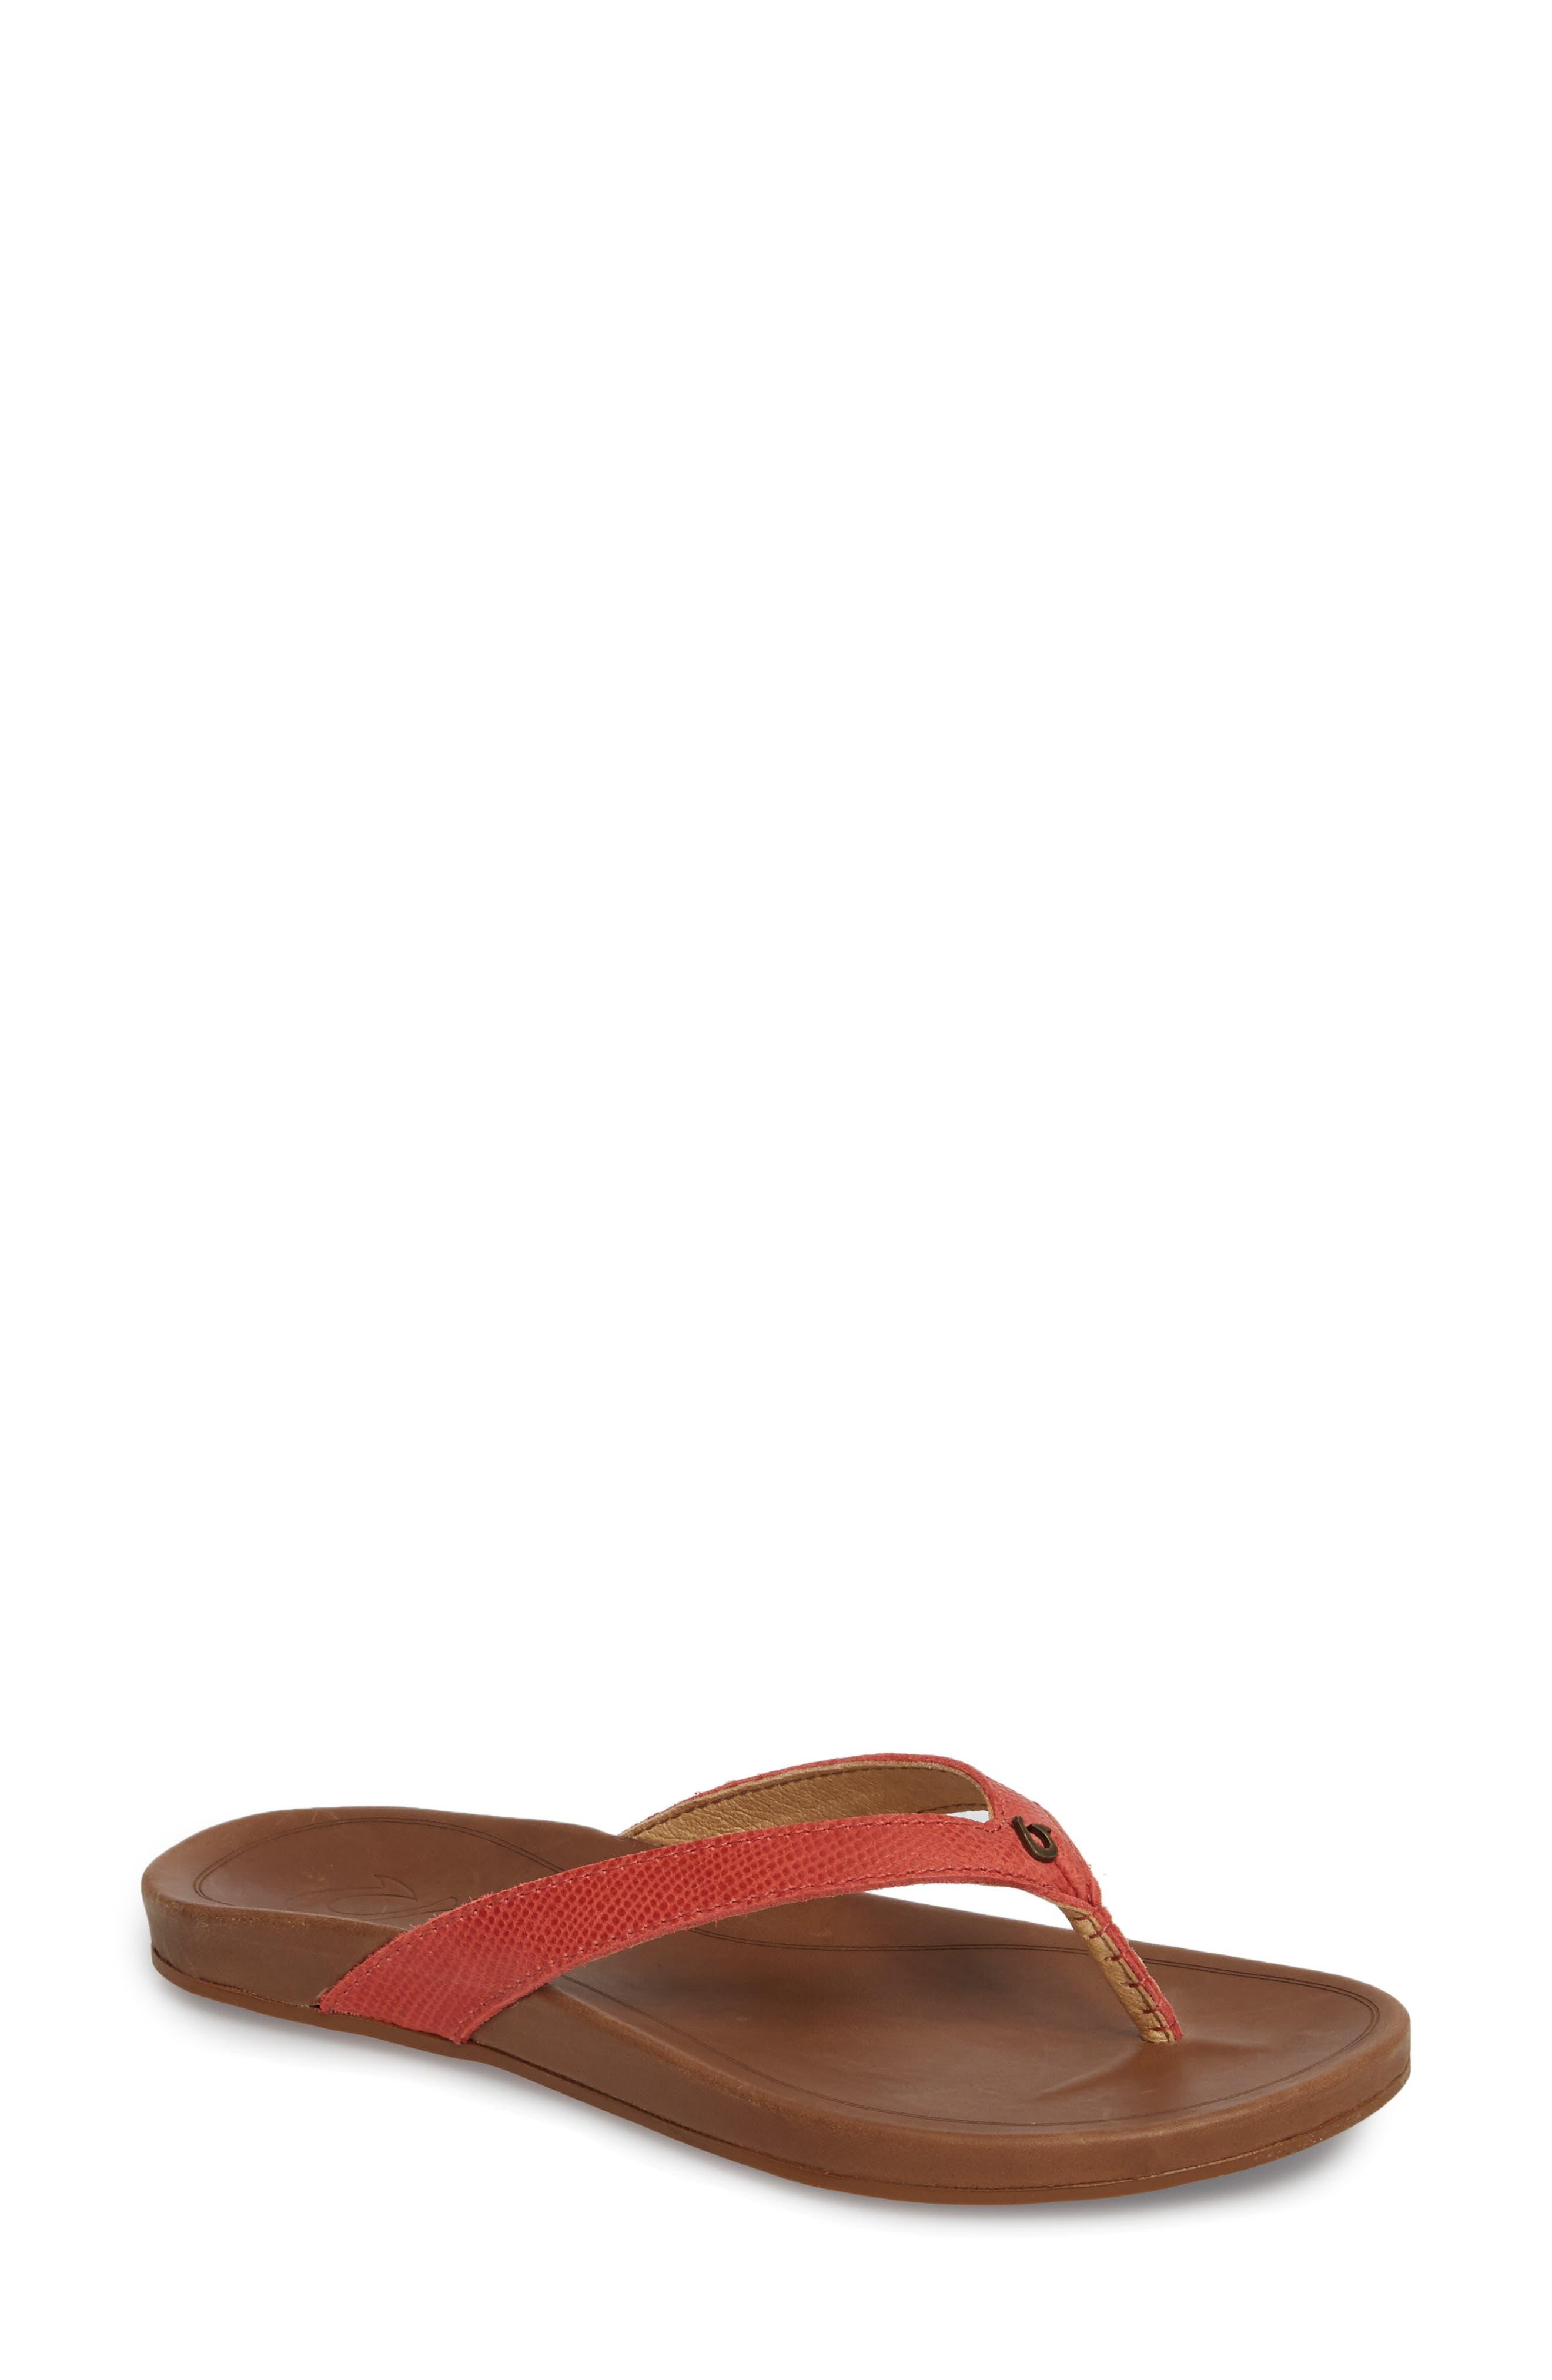 'Hi Ona' Flip Flop,                             Main thumbnail 1, color,                             Paprika/ Tan Leather